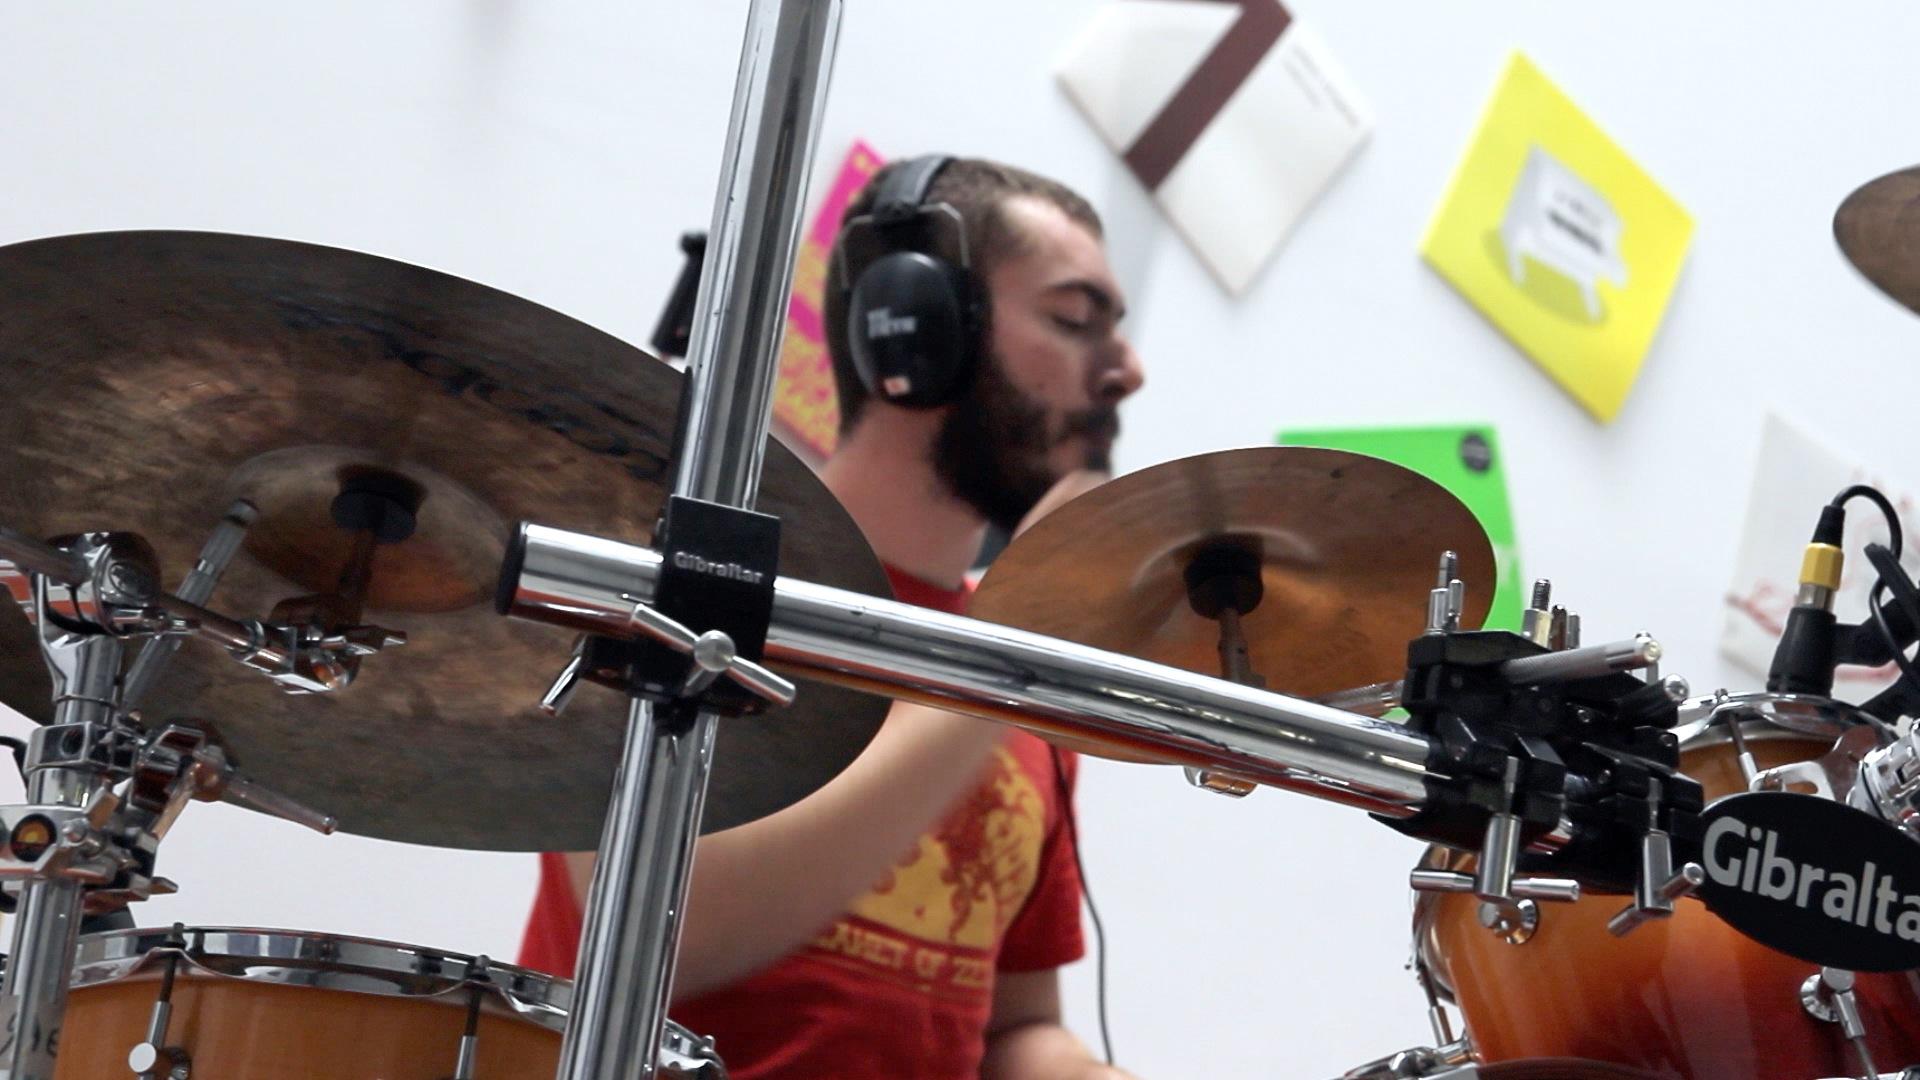 https://panoponti.com/wp-content/uploads/2016/09/the-ultimate-drum-recording.jpg